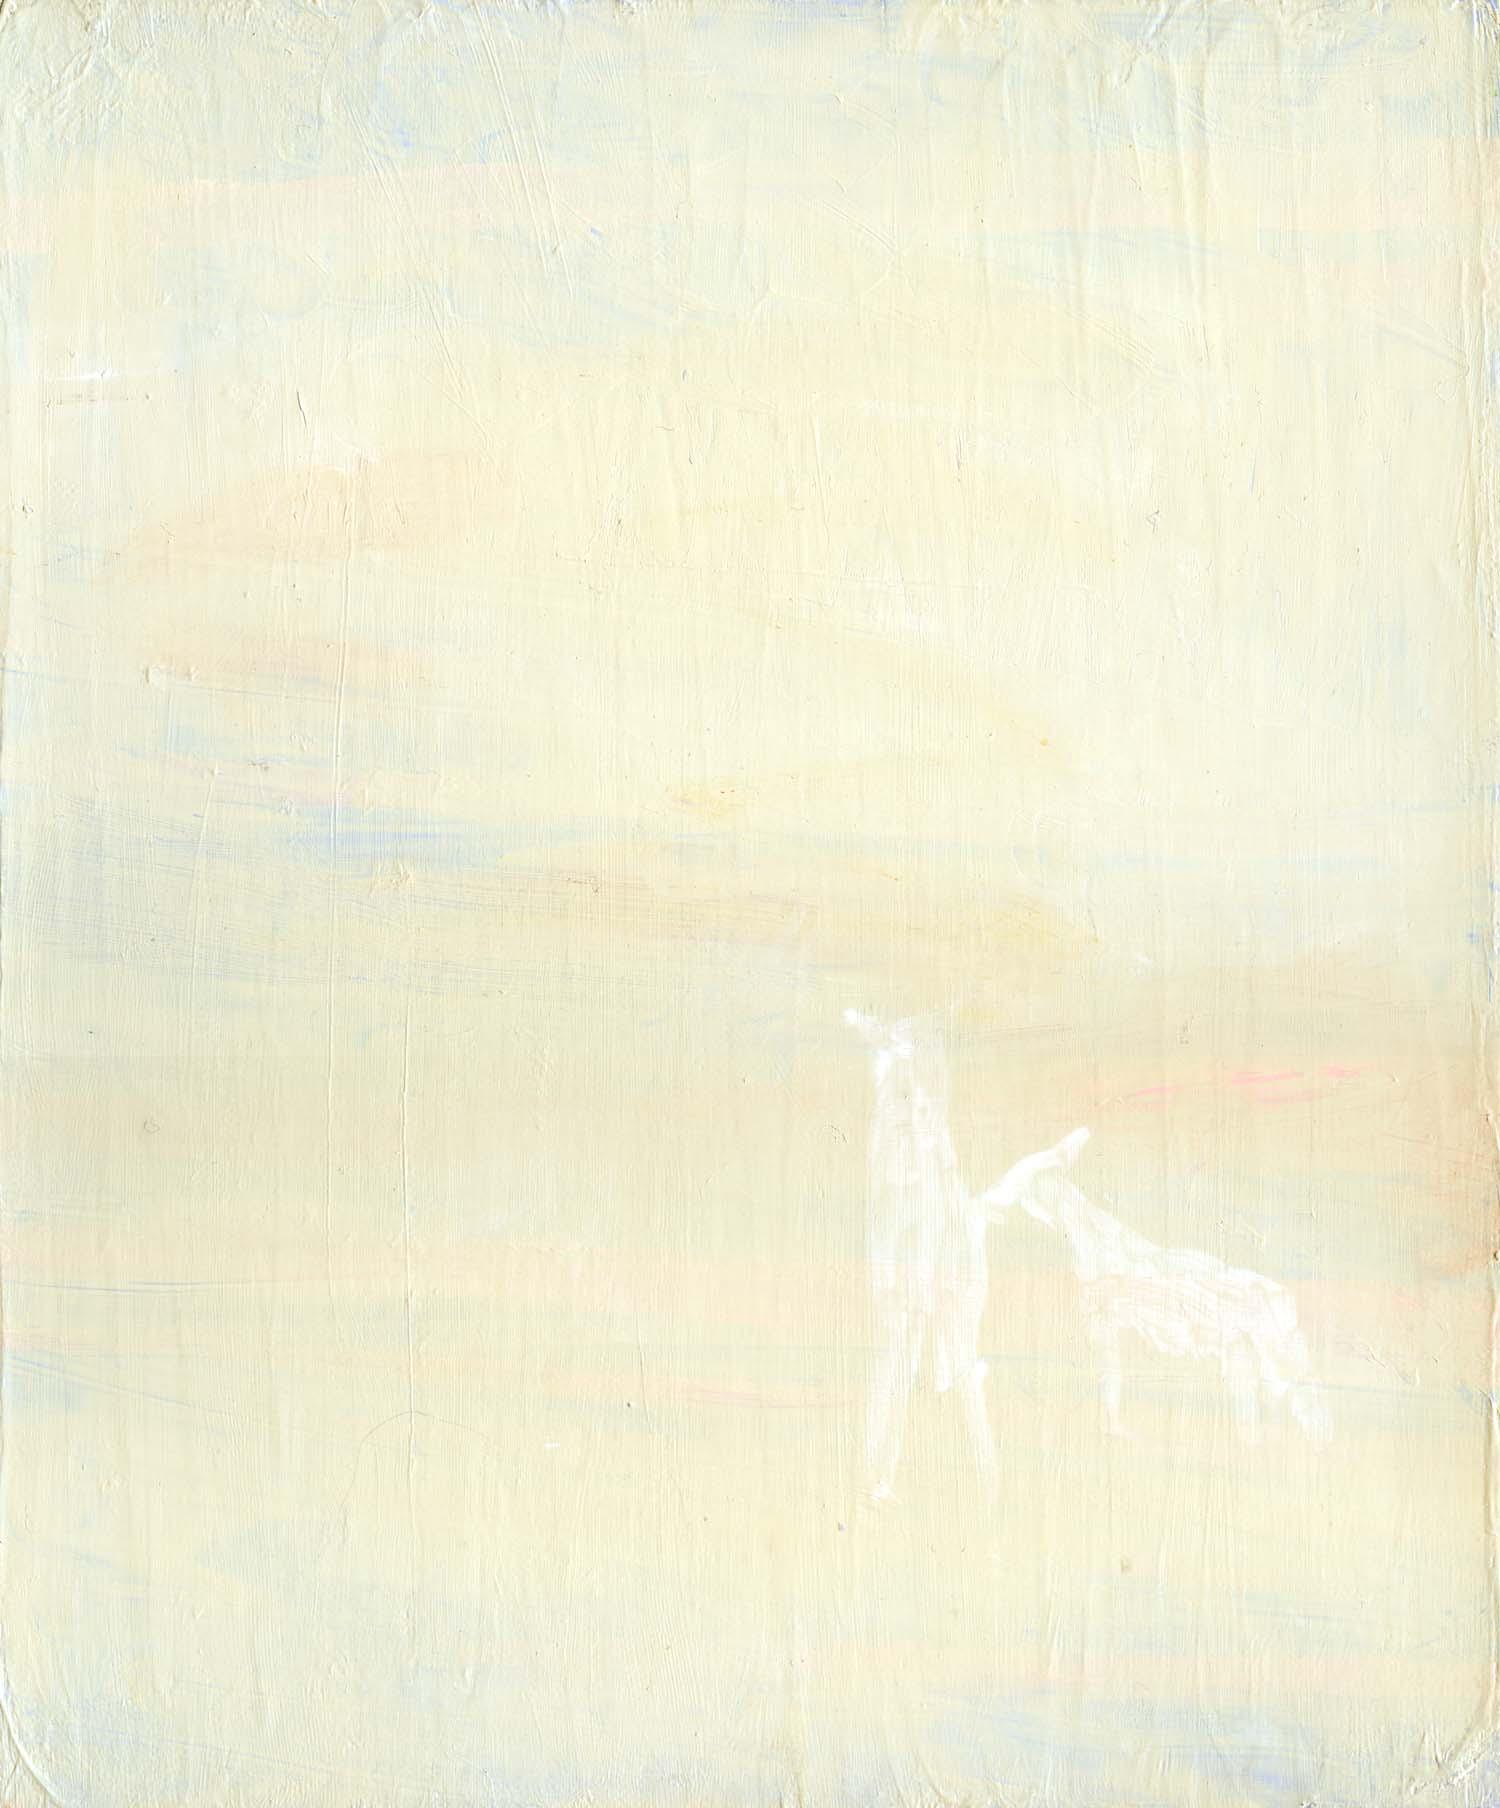 Cloudspotter , 2008 30.5 x 25.5 cm oil on canvas